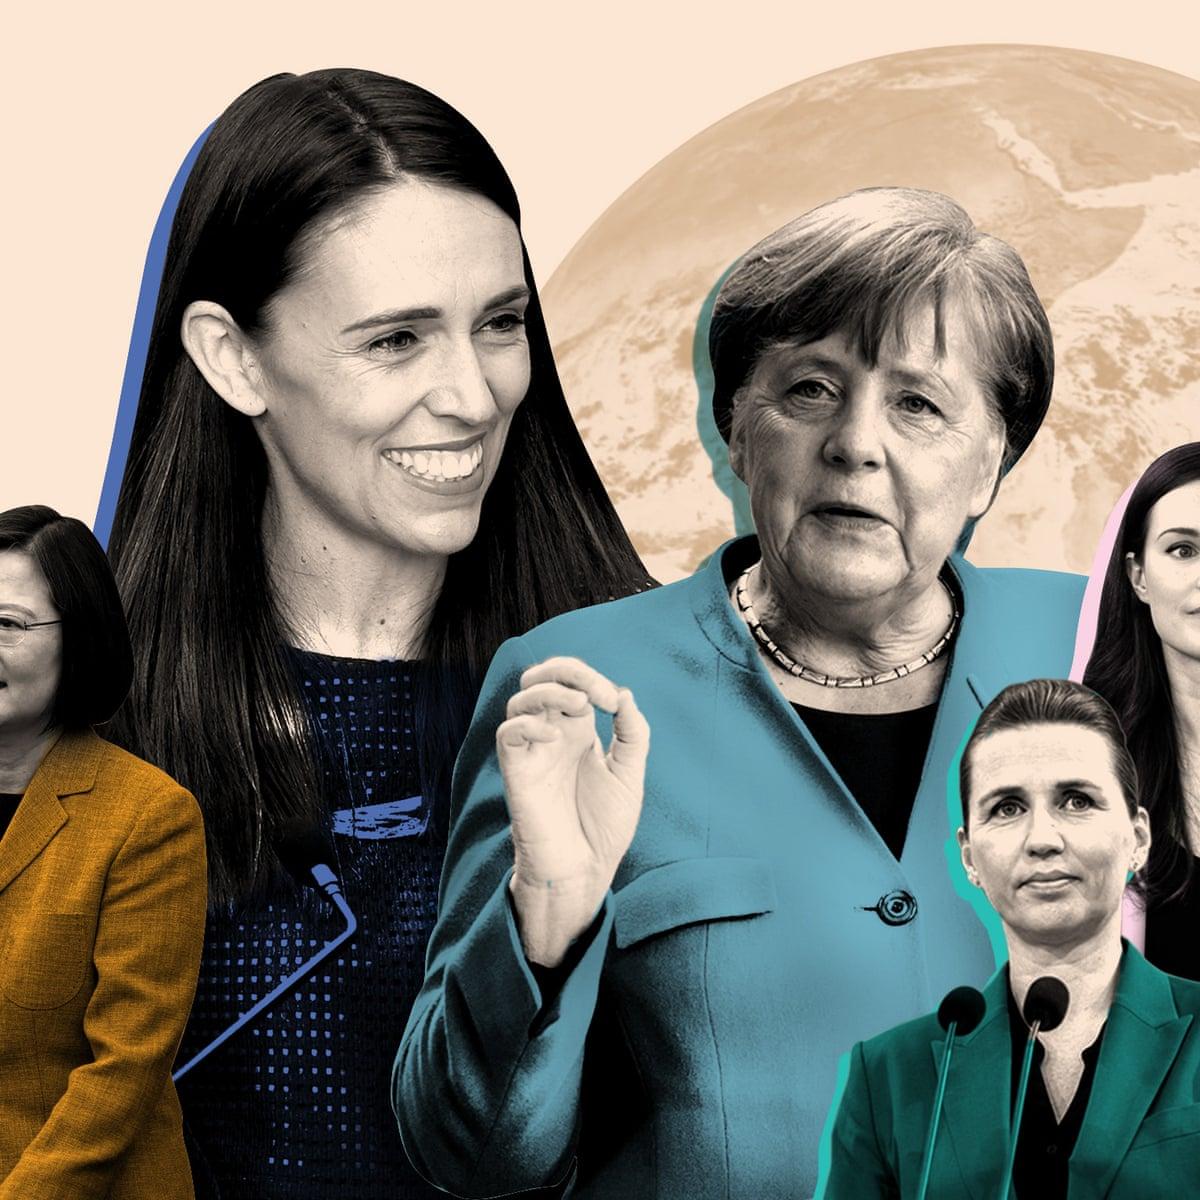 https://www.acceleratorfrankfurt.com/wp-content/uploads/2020/08/2560.jpg